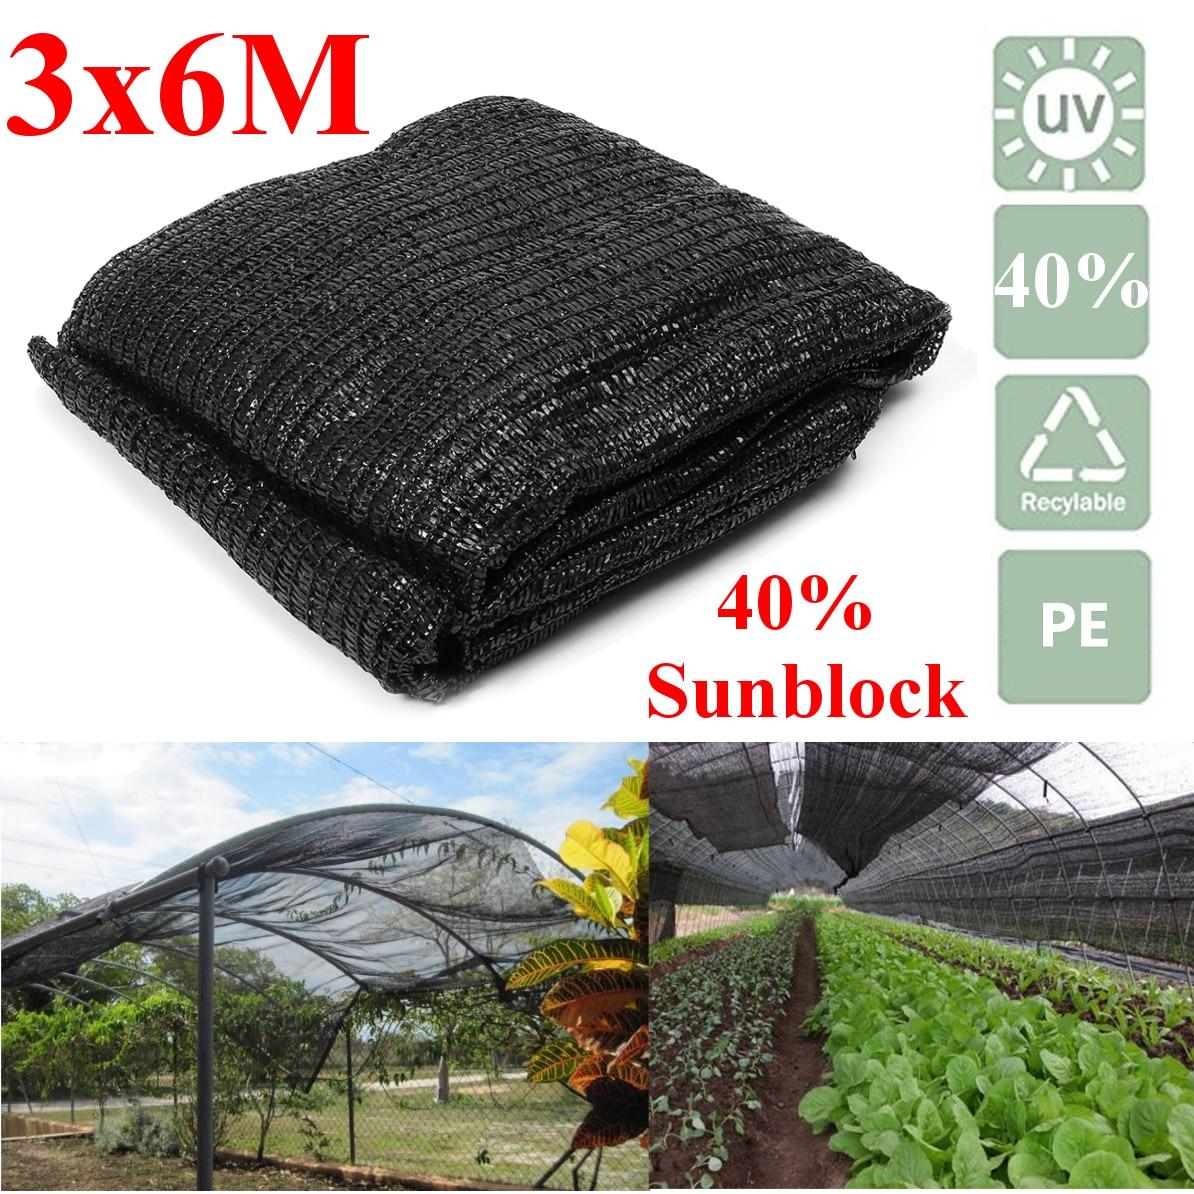 6x3m Black Sunblock Shade Cloth Plant Cover Shading Anti UV Outdoor Sunscreen Shelter Canopy Patio Garden Decoration PE Netting